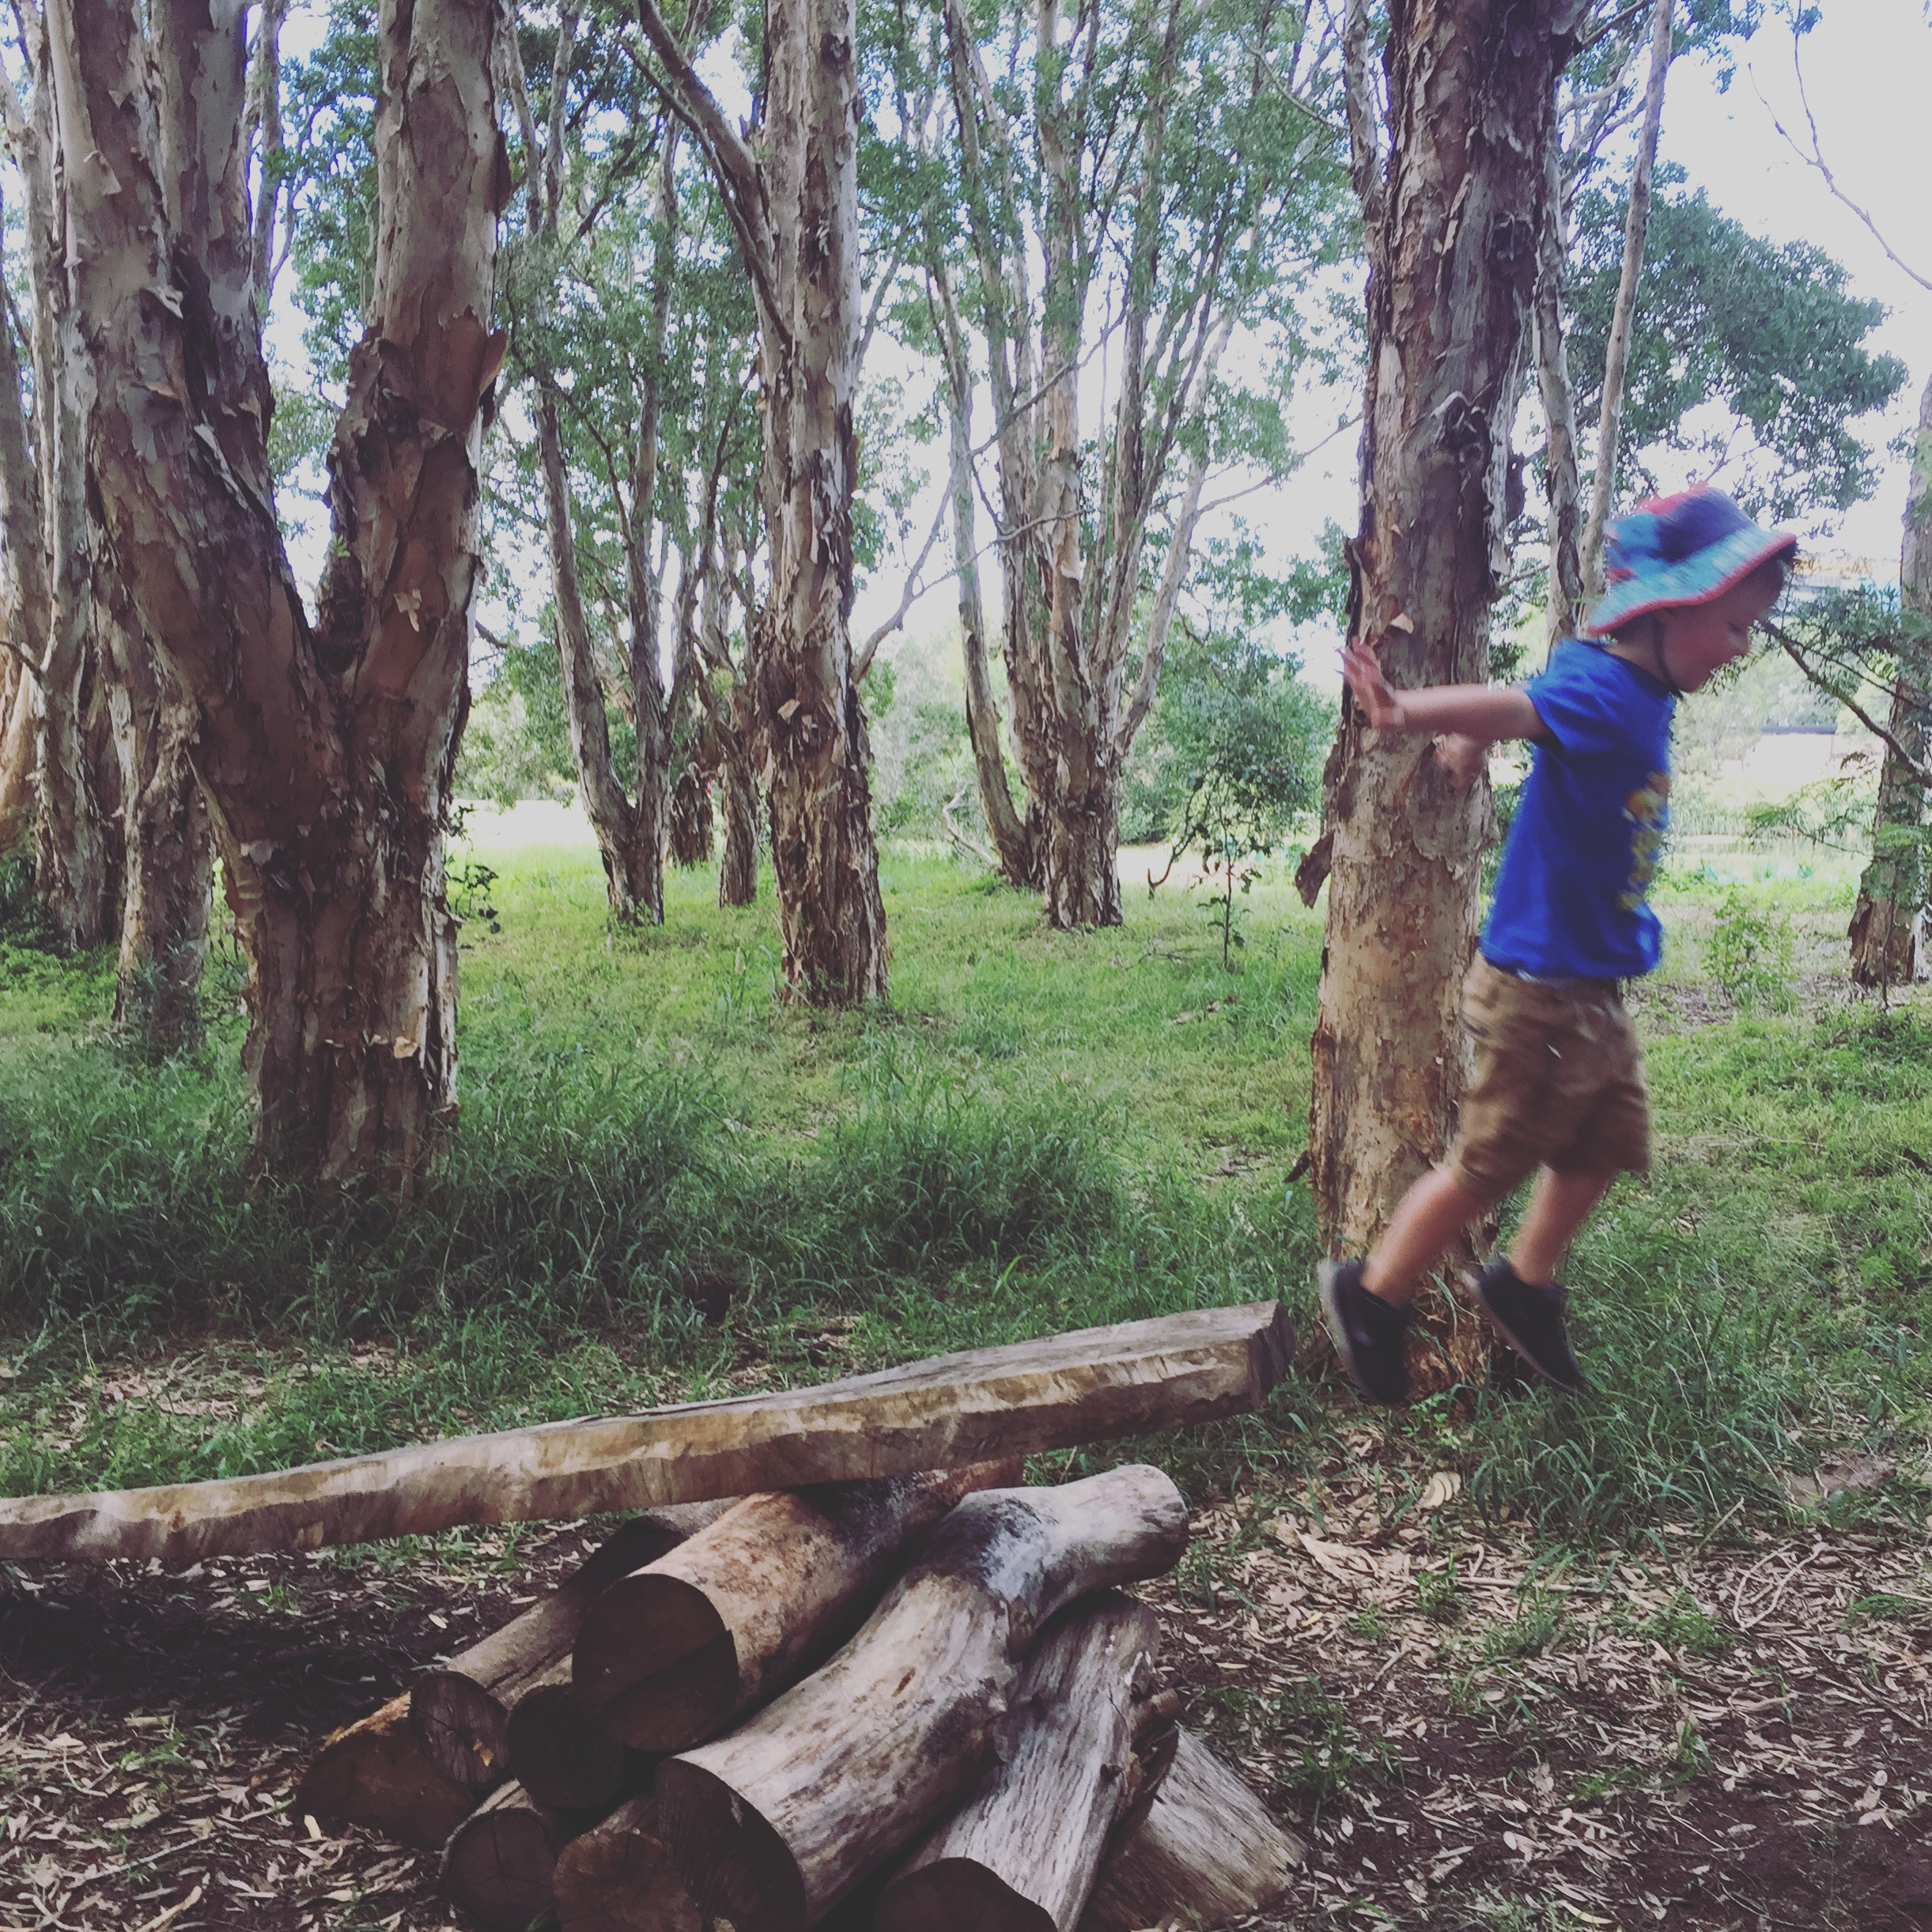 barefoot wellbeing - bush school - sydney australia - nature connect - mindfulness - movement - yoga - nature walks- Louise Kiddell .JPG